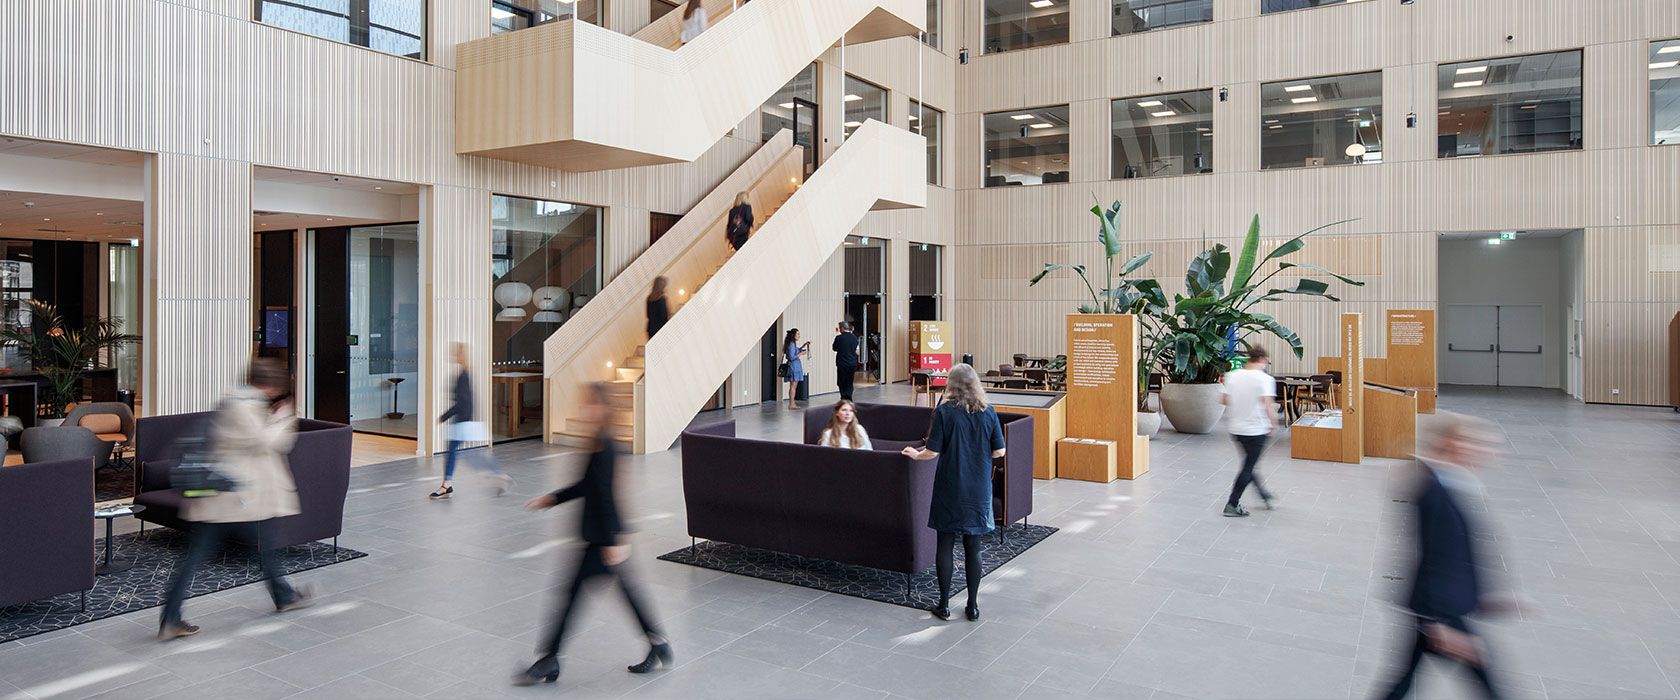 Sweco HQ atrium